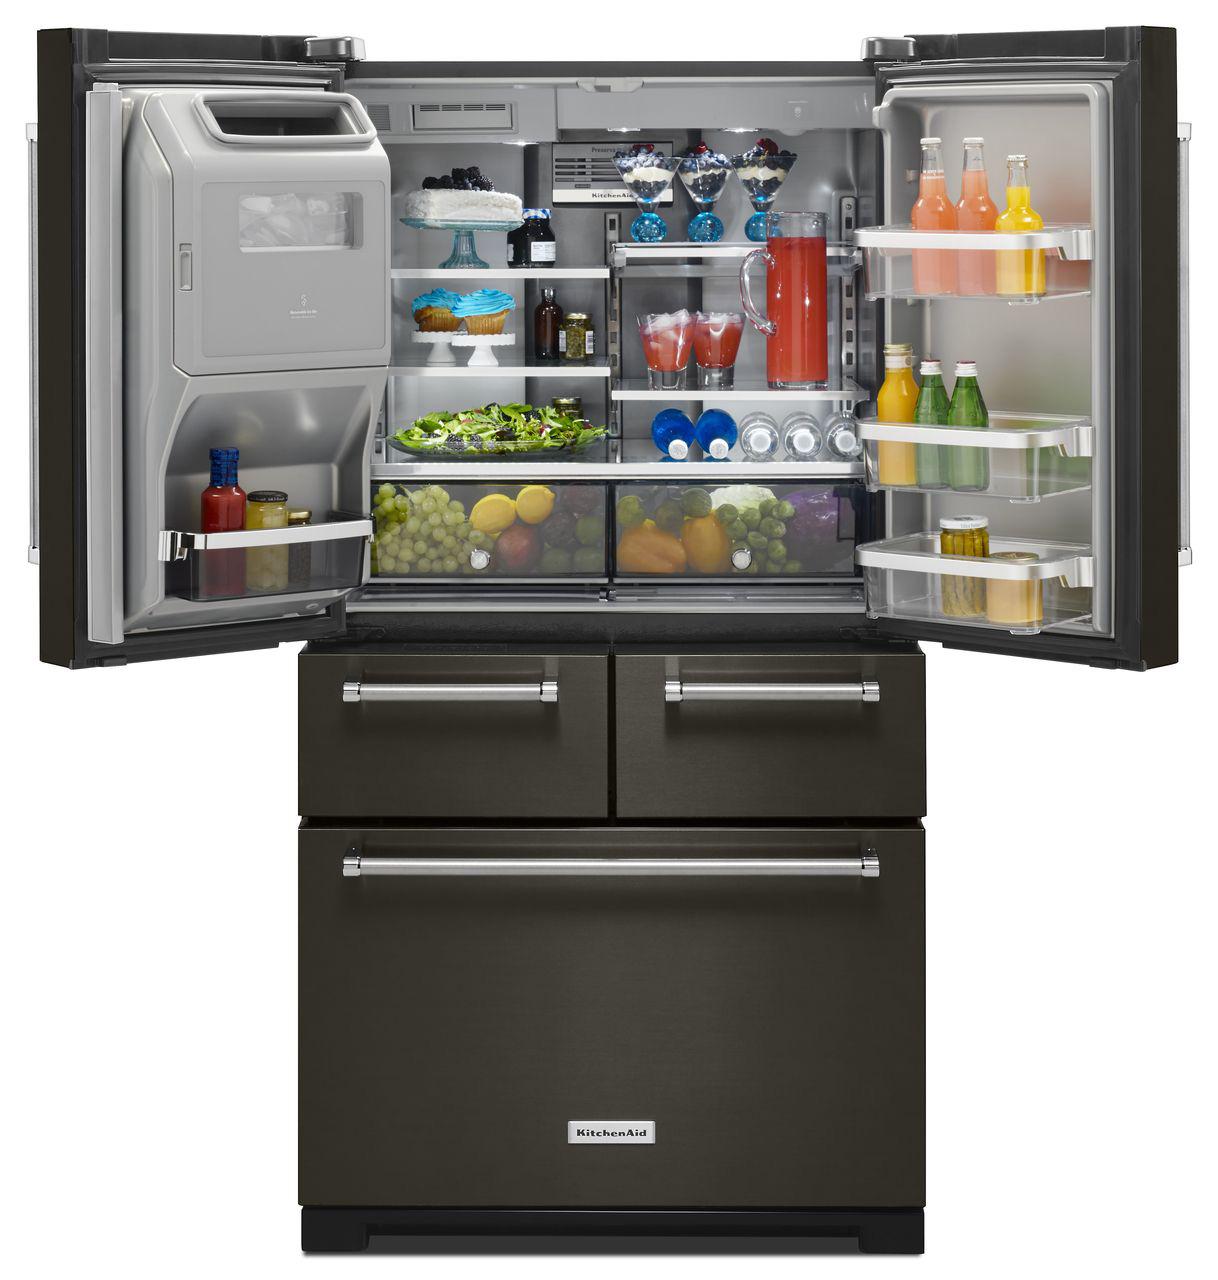 Kitchenaid Refrigerator Black Stainless kitchenaid black stainless refrigerator - krmf706e